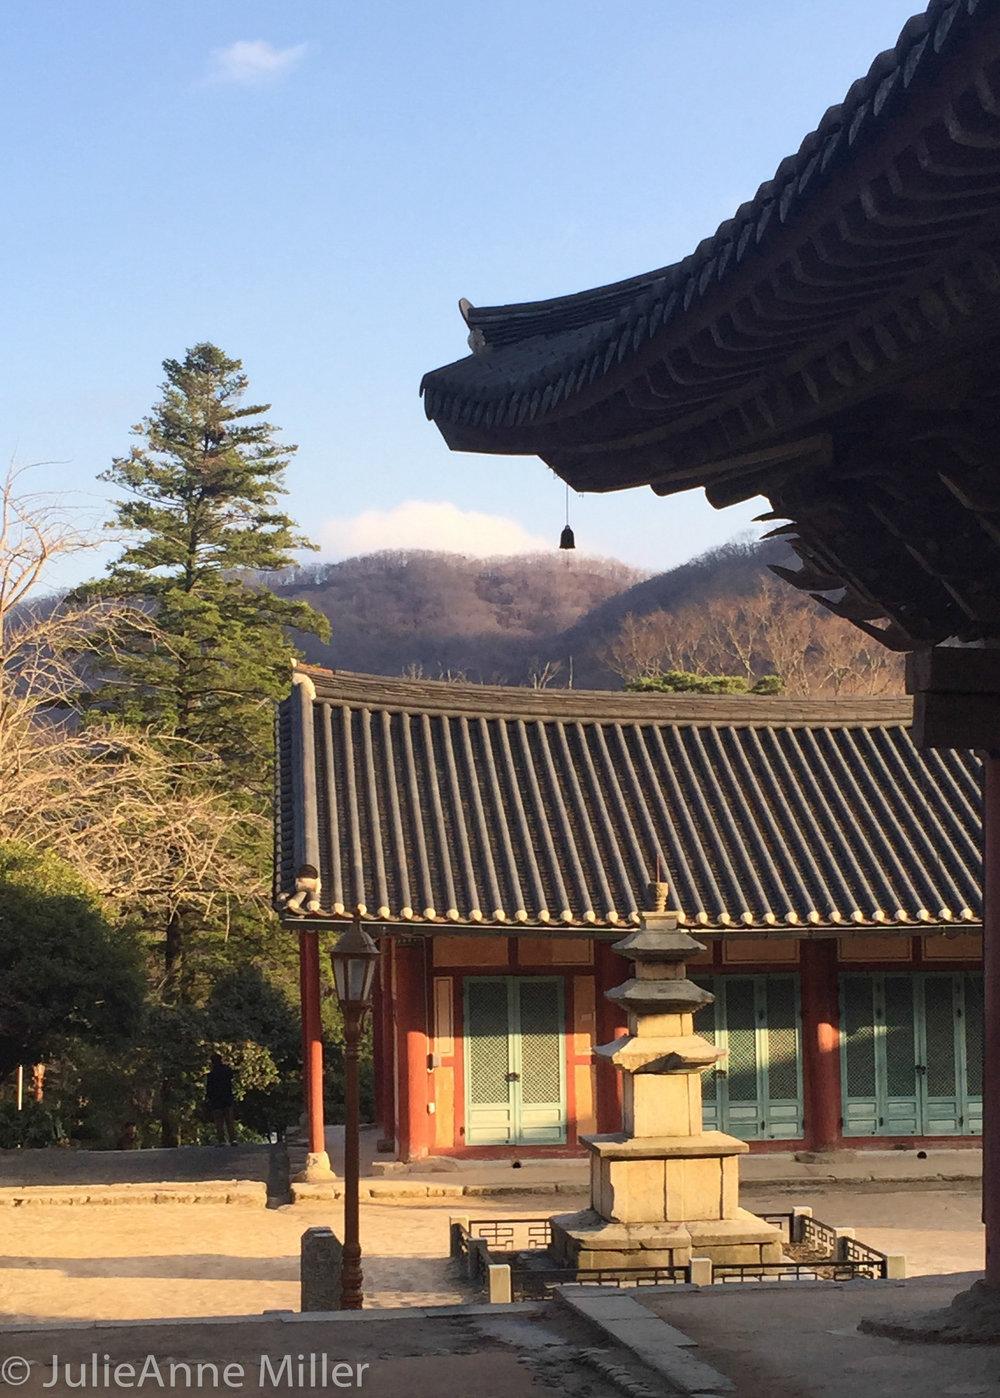 Seonamsa Temple, Jogyesan Park, Korea